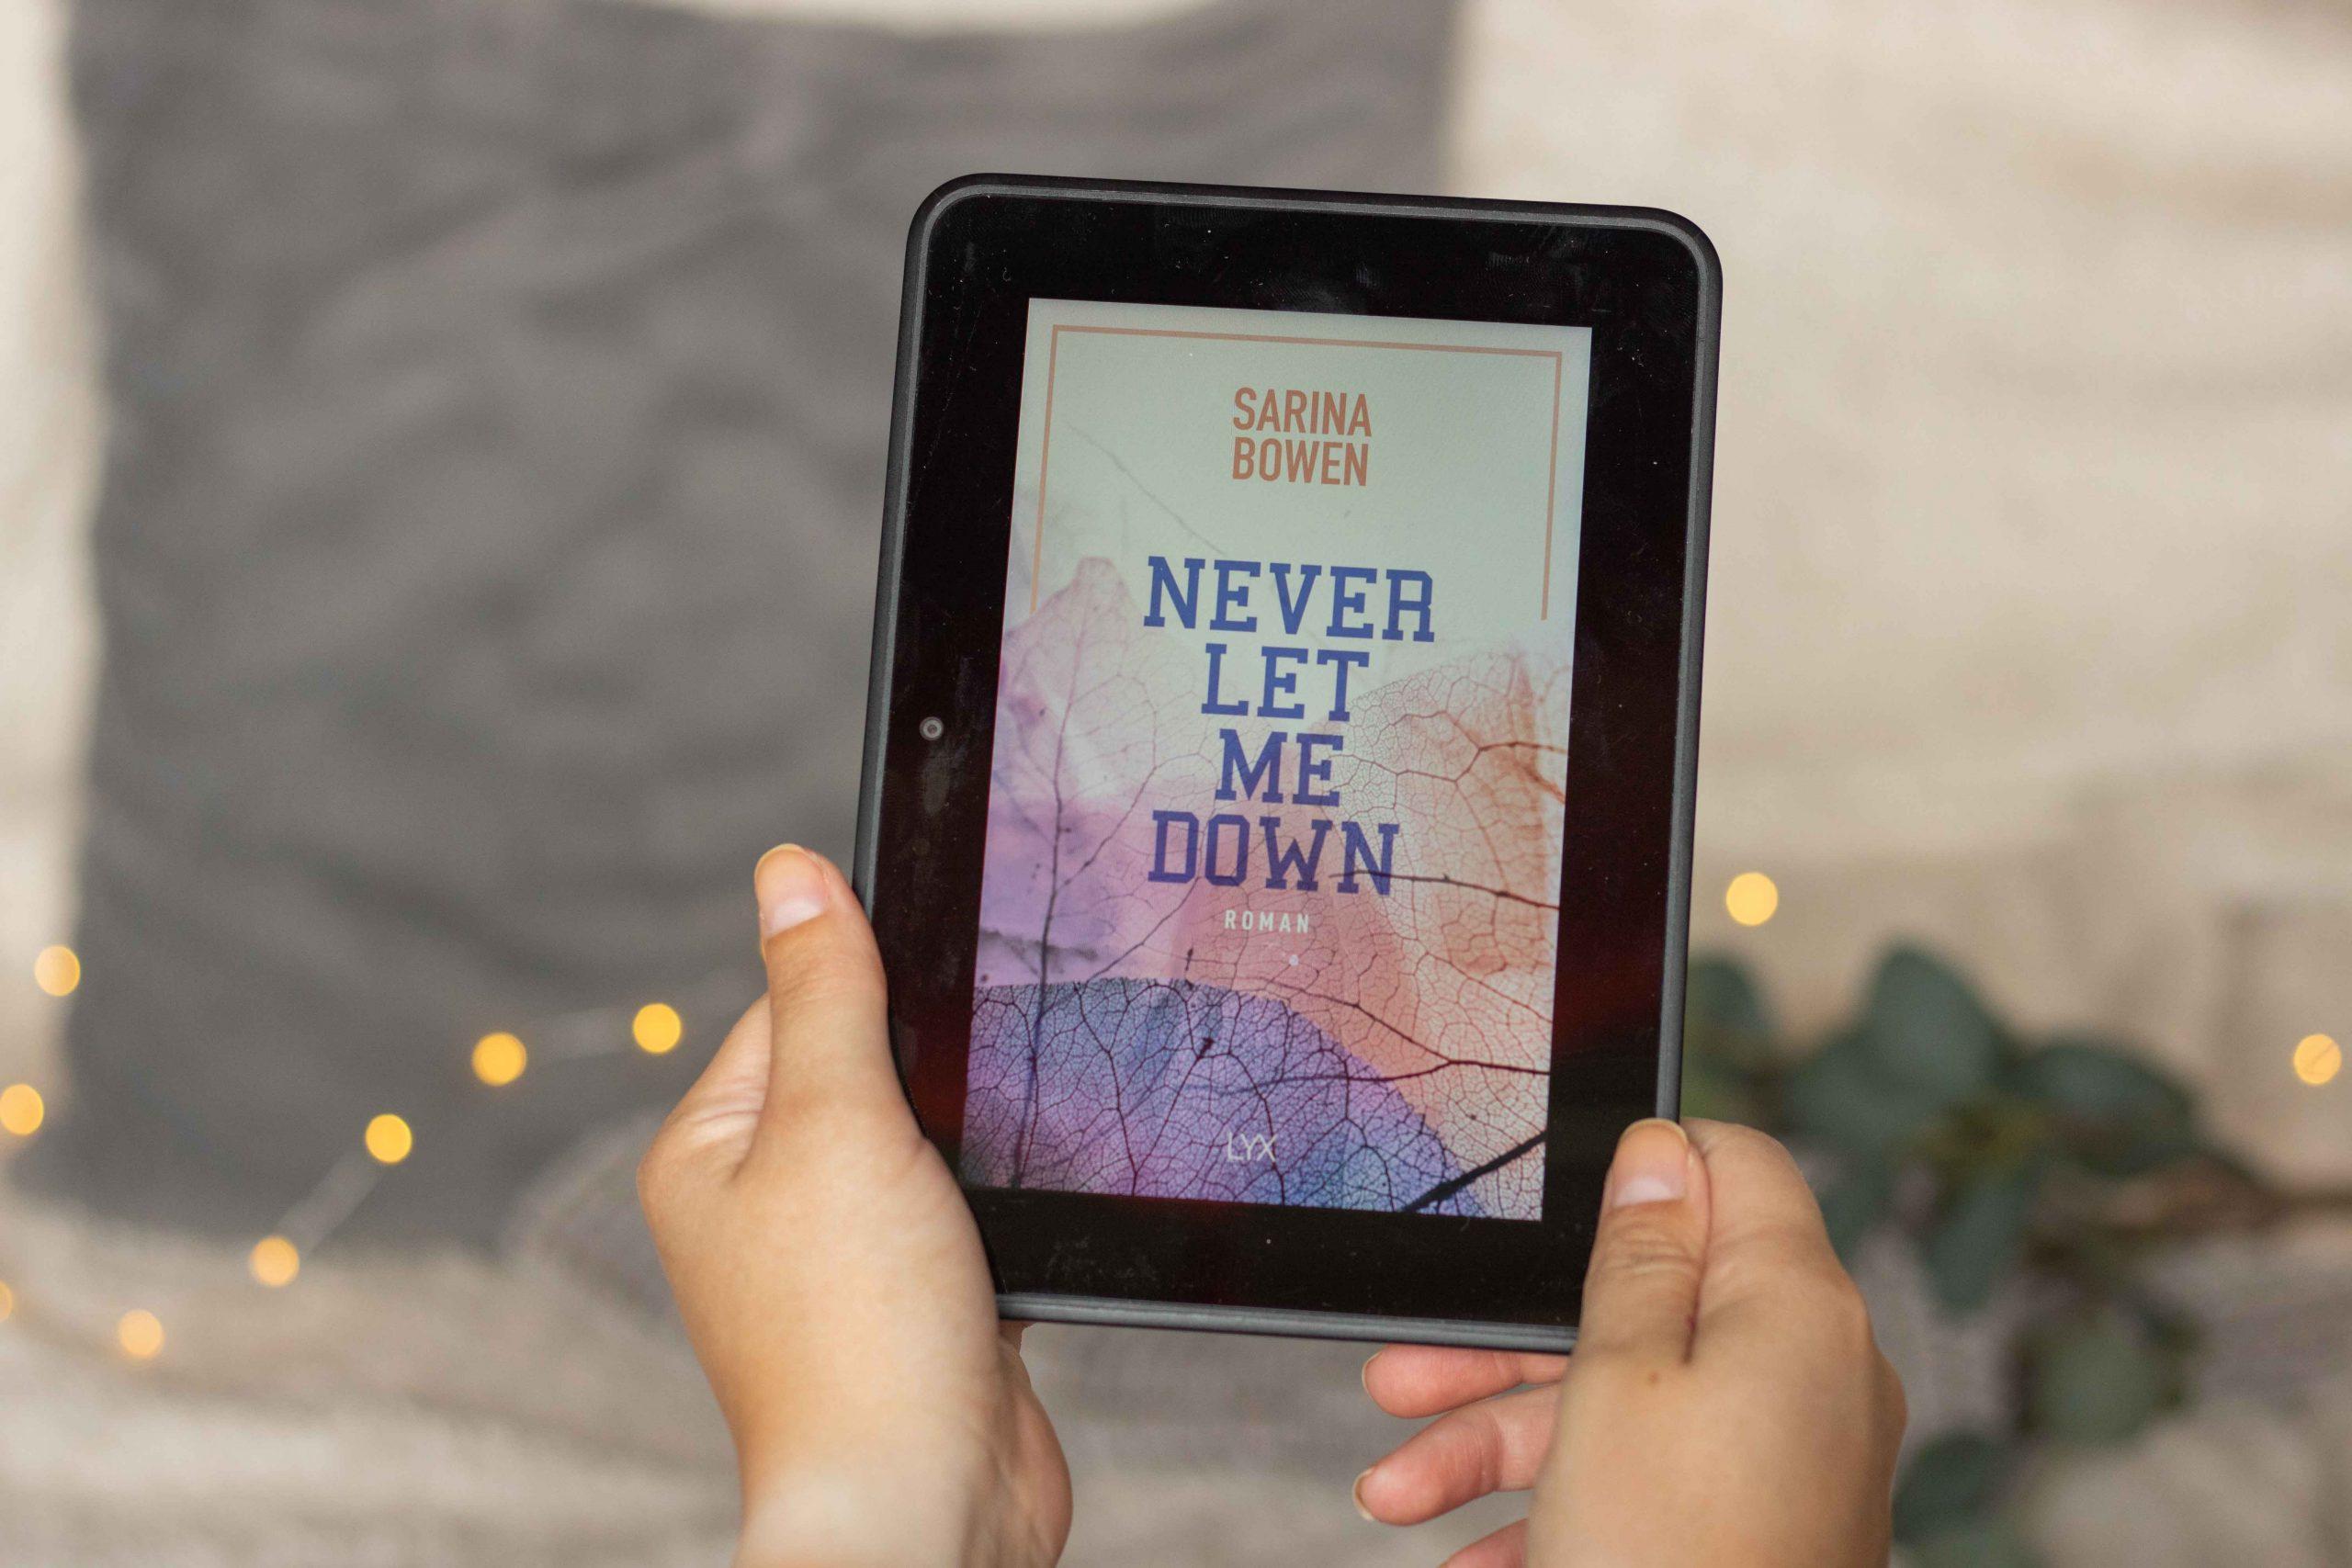 Never let me down | Sarina Bowen